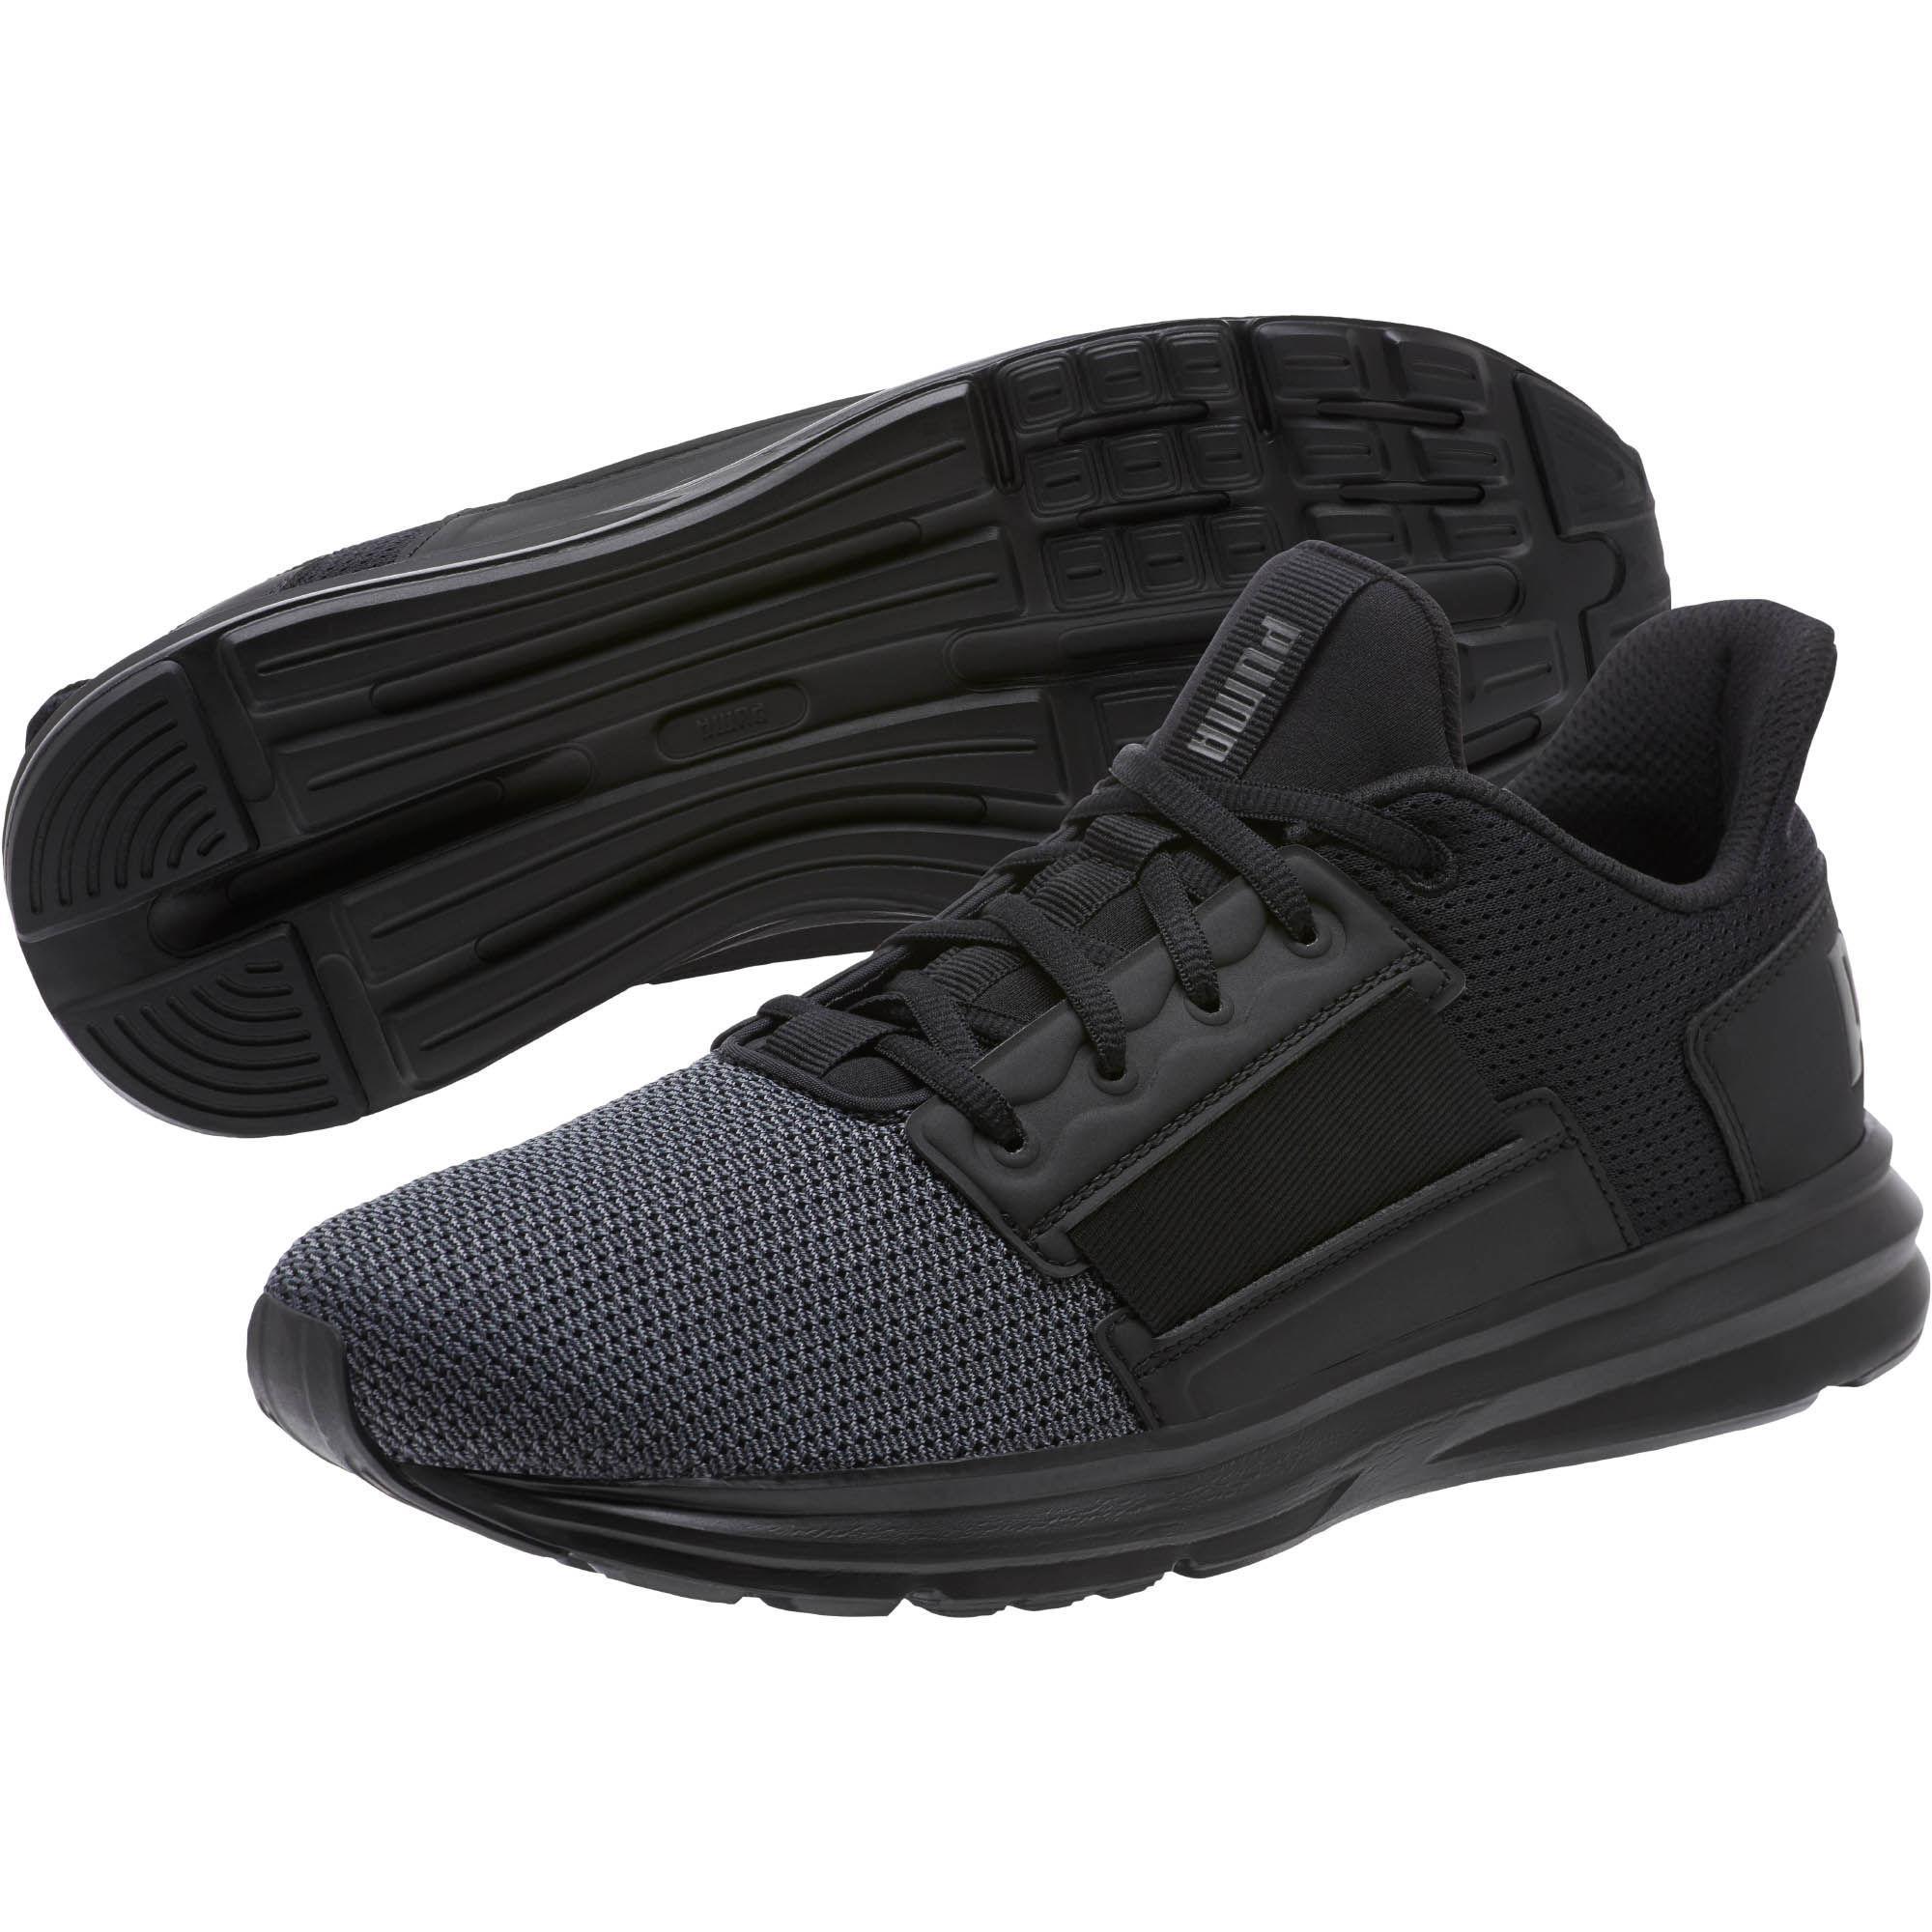 b43a244b7bb7 PUMA - Black Enzo Street Running Shoes for Men - Lyst. View fullscreen